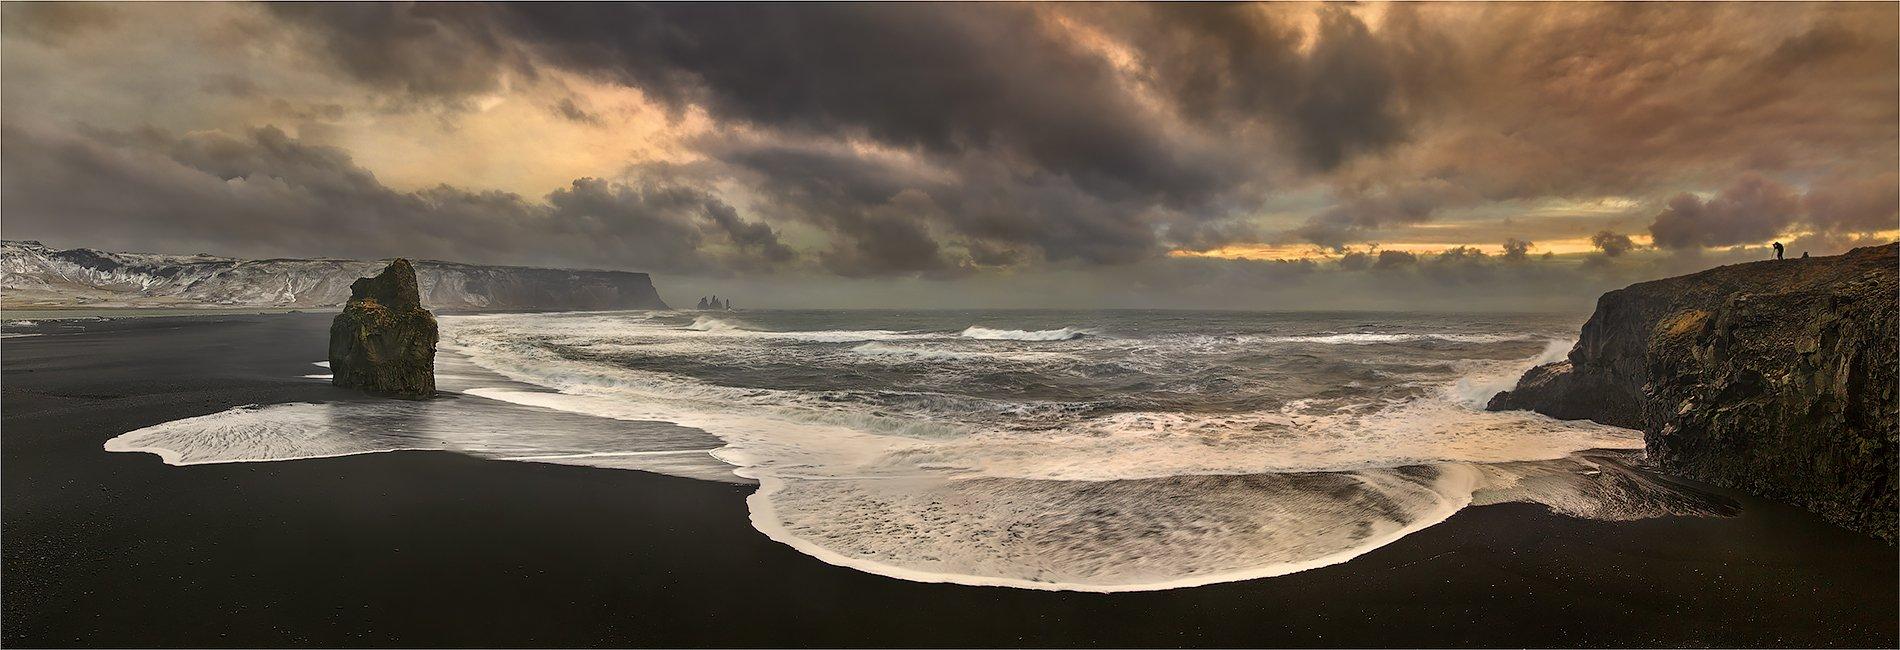 исландия, Yury Pustovoy (artphoto-tour.com)